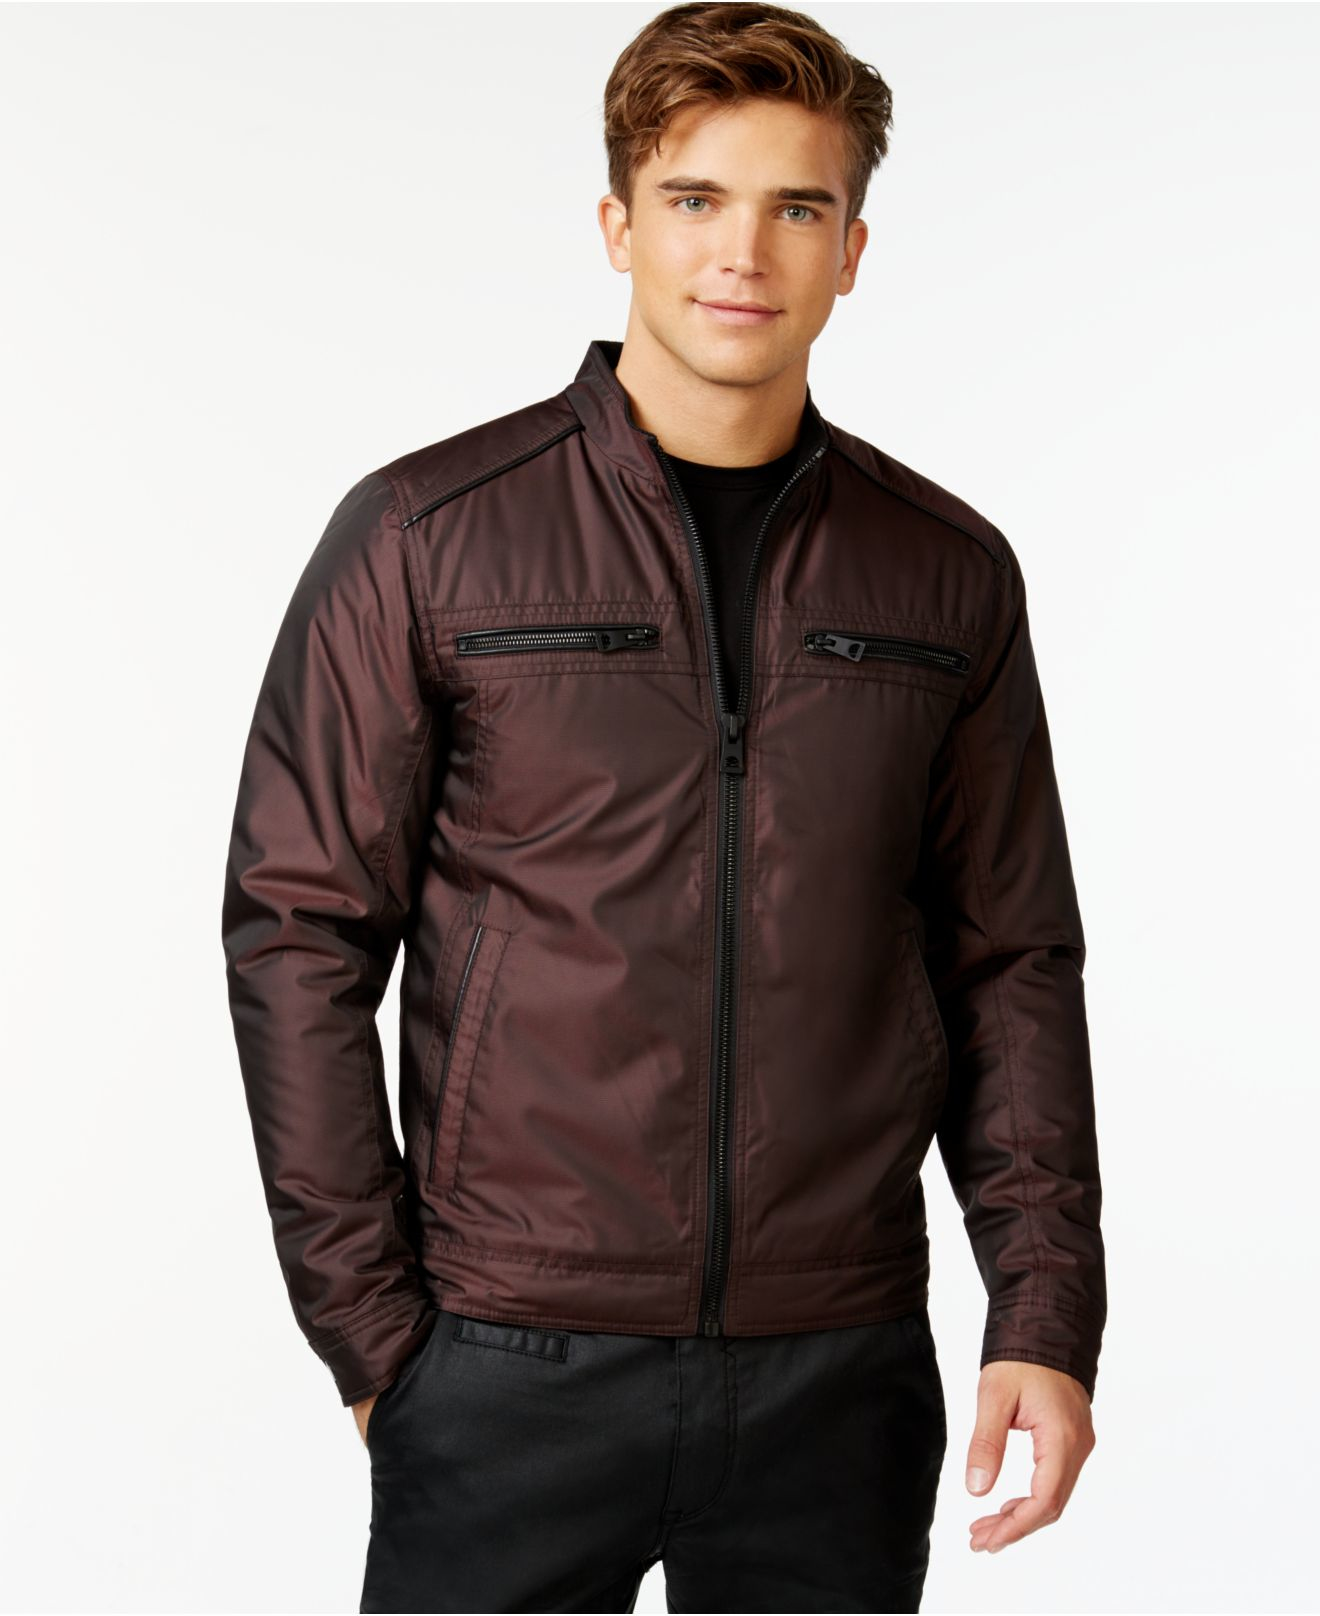 Jacket - myjacketoutlet.com - Part 208